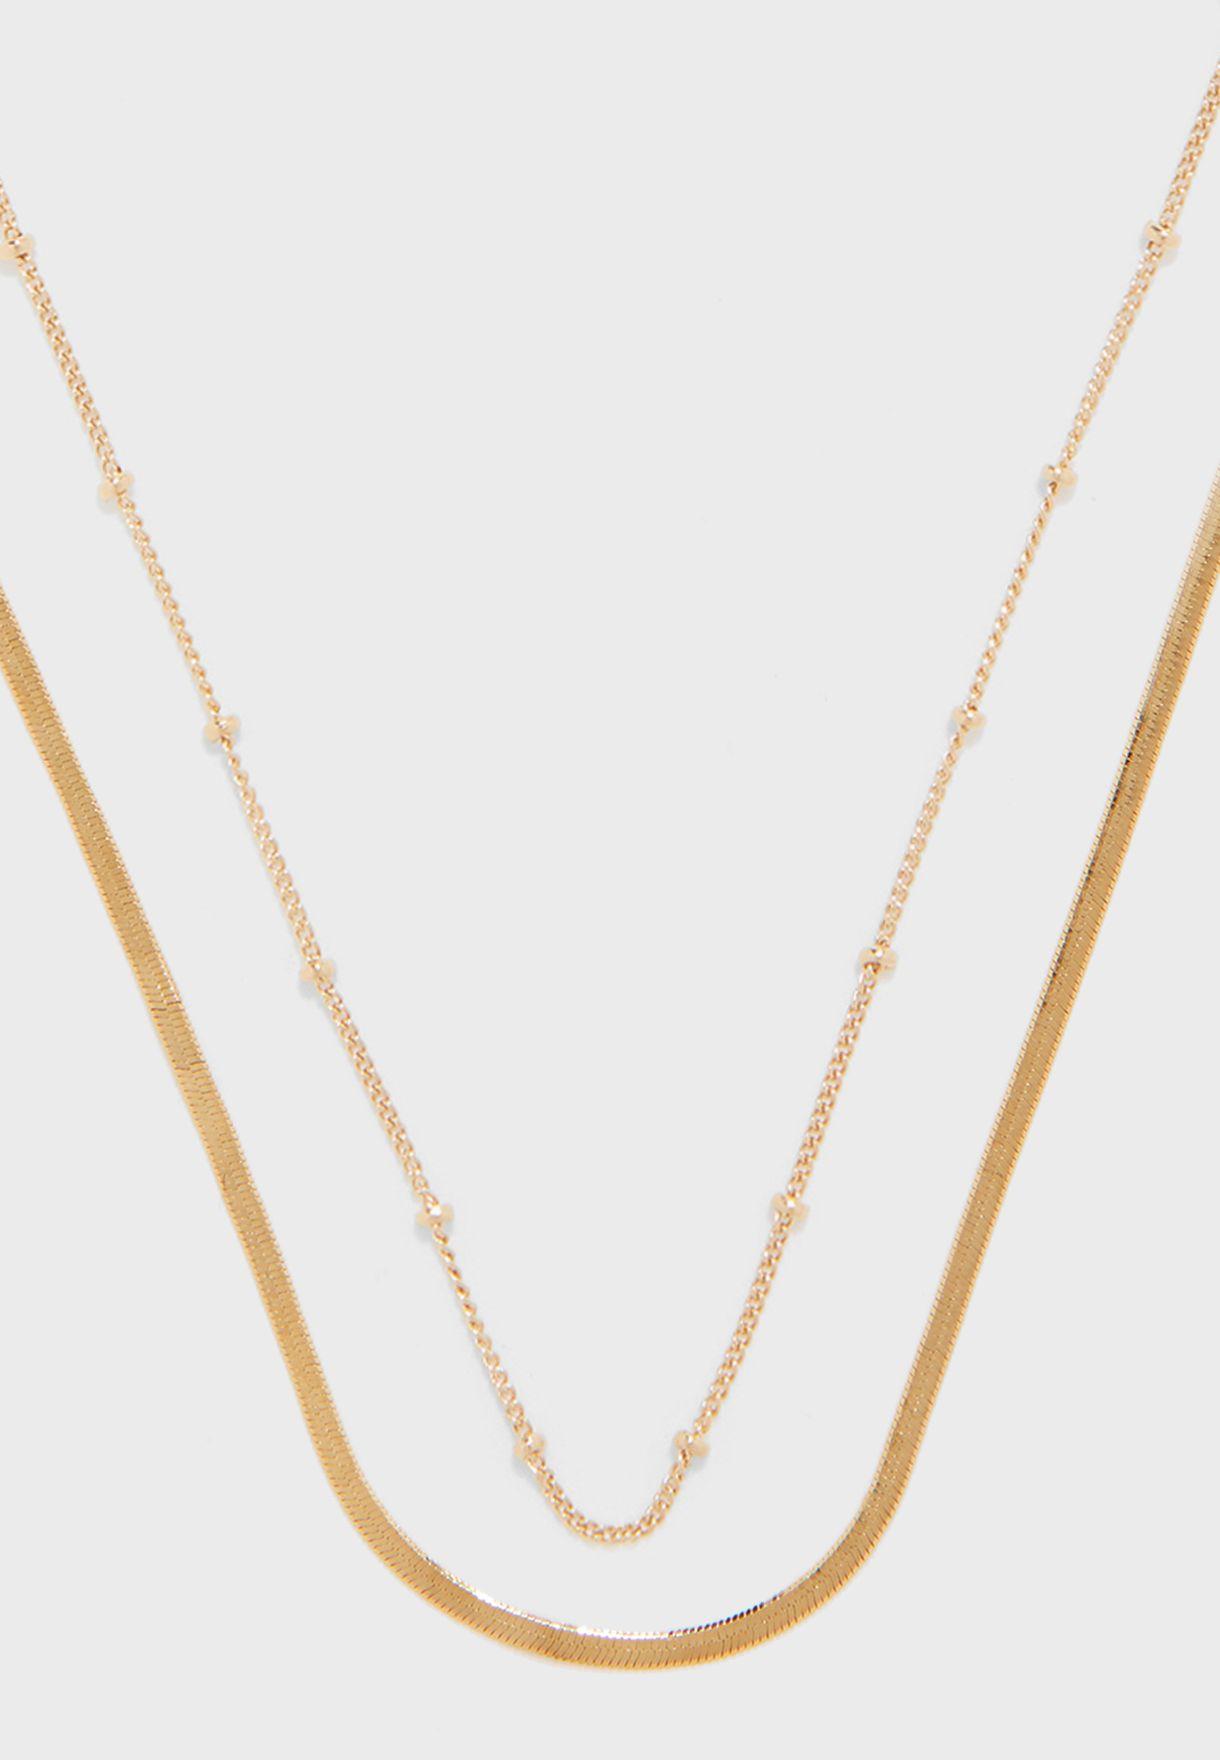 Satellite & Flat Snake Layered Chain Necklace